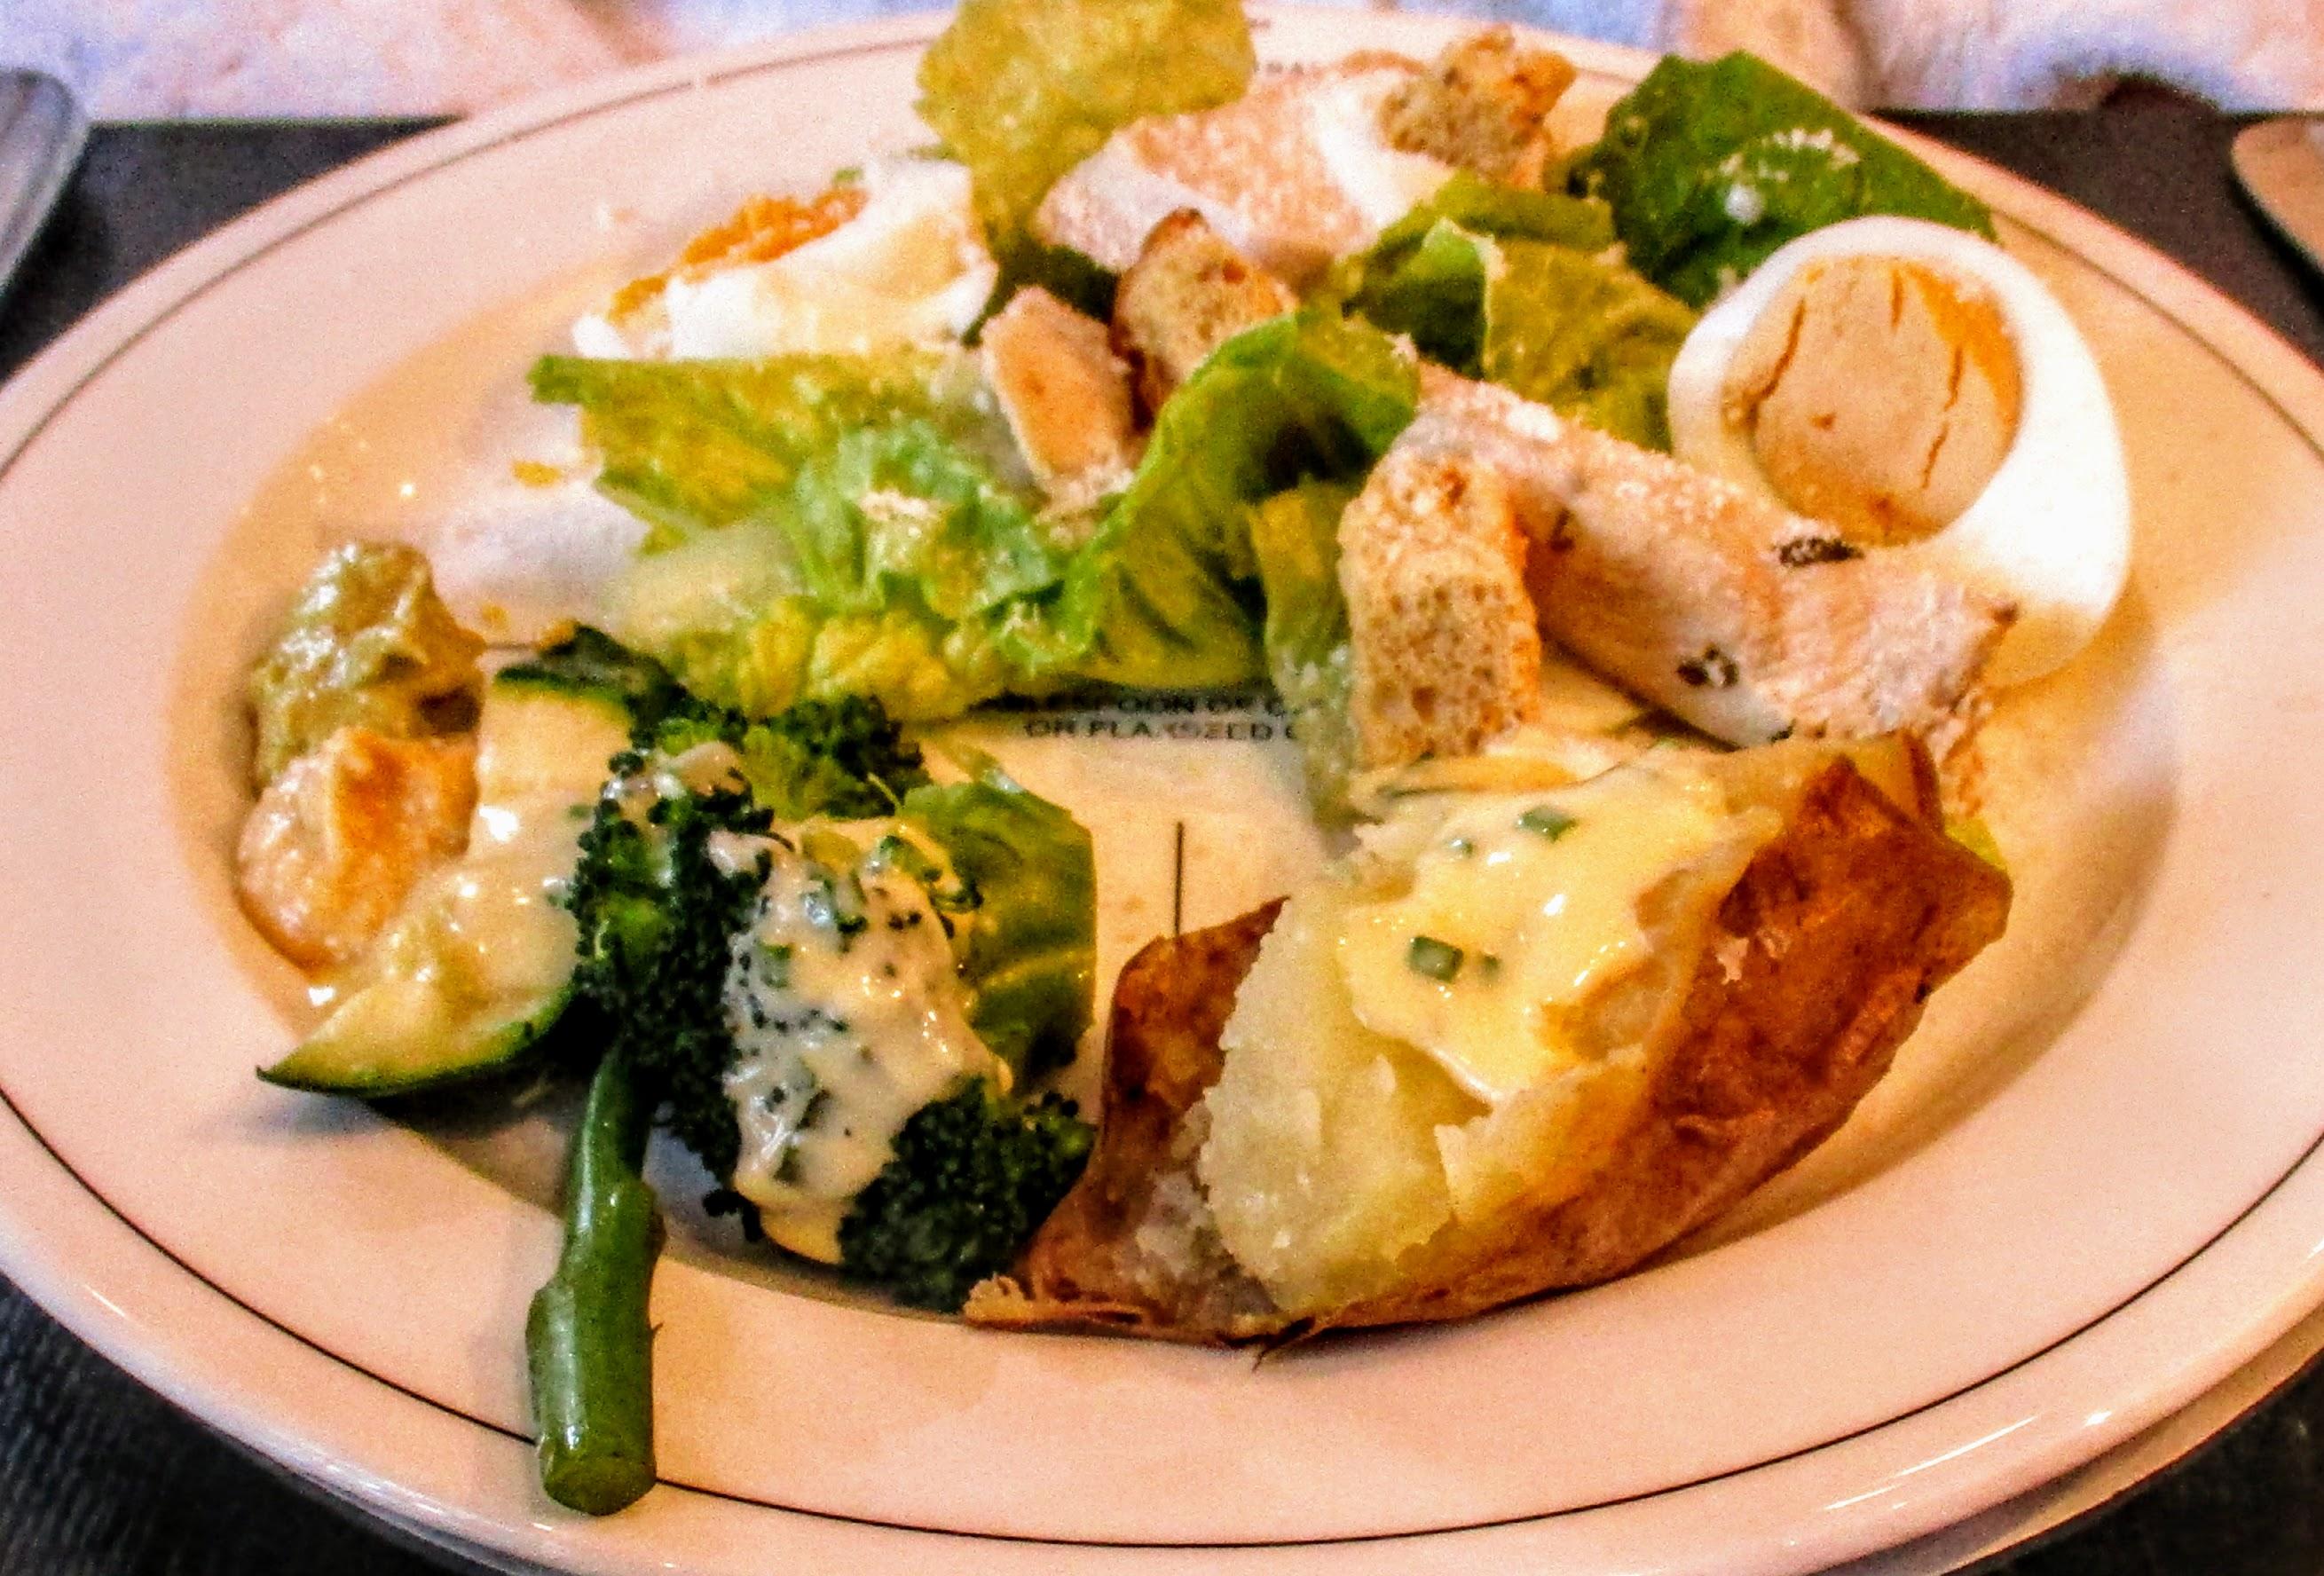 a week of healthy eating at champneys spa resort tring